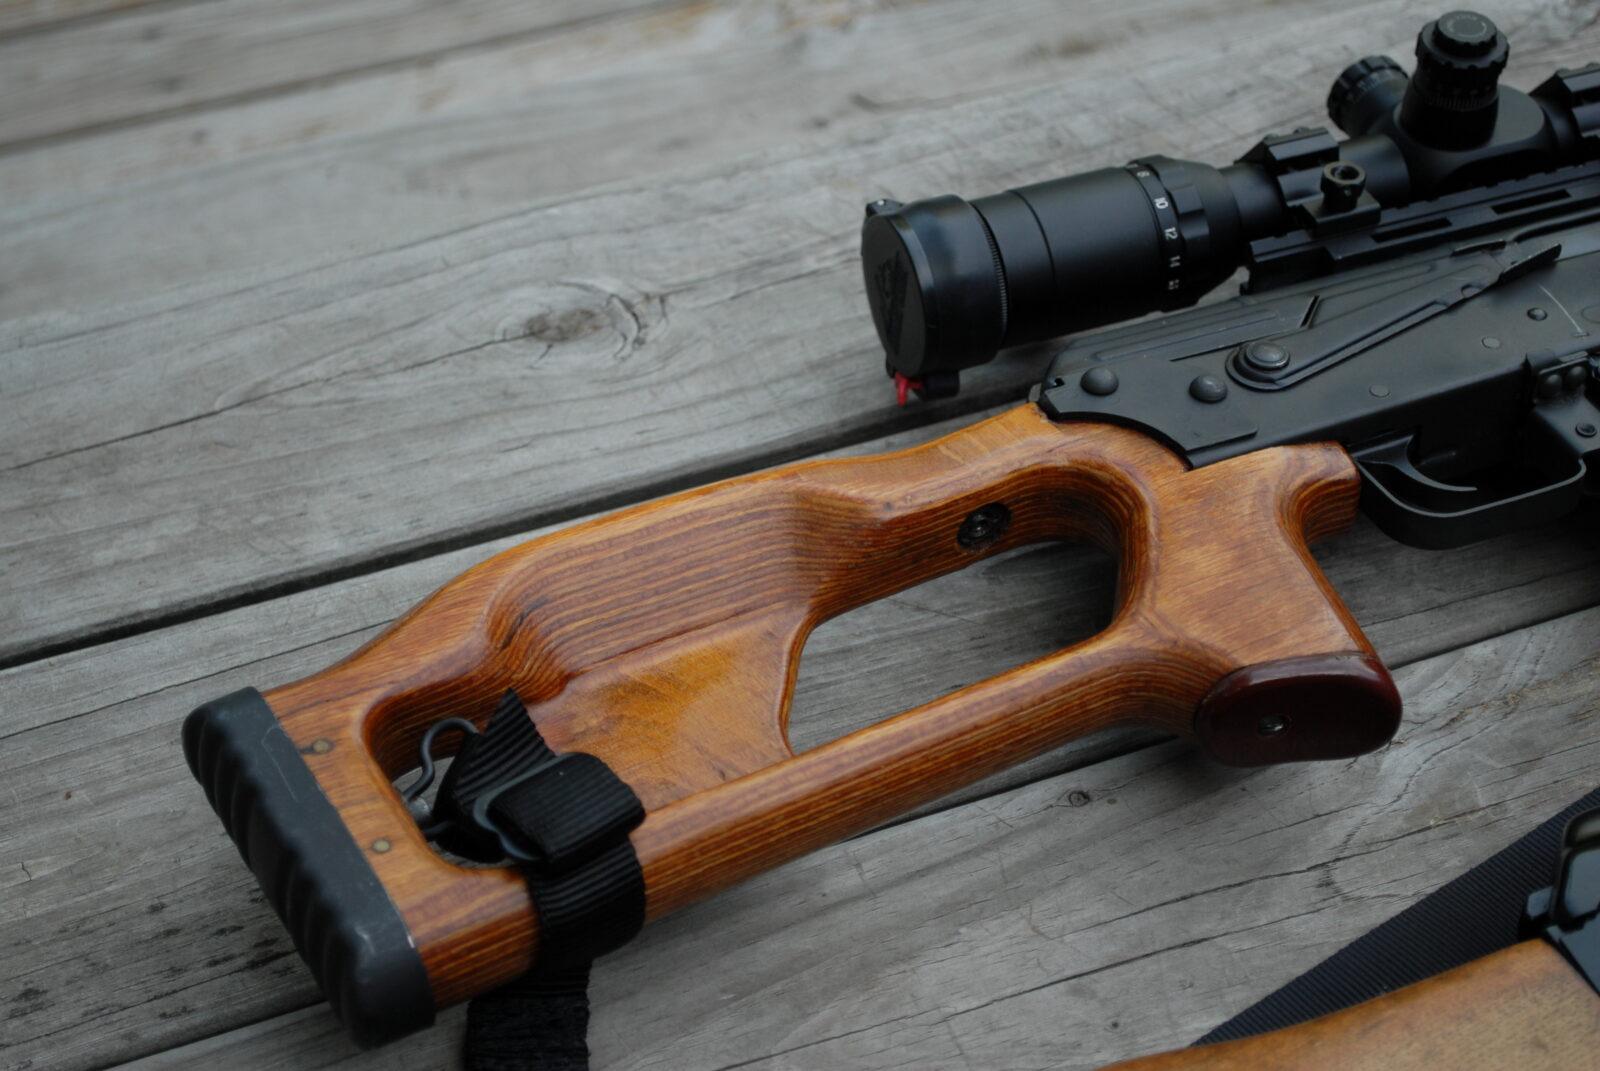 The Romanian PSL Rifle - Feeling Nostalgic for the 7 62x54R